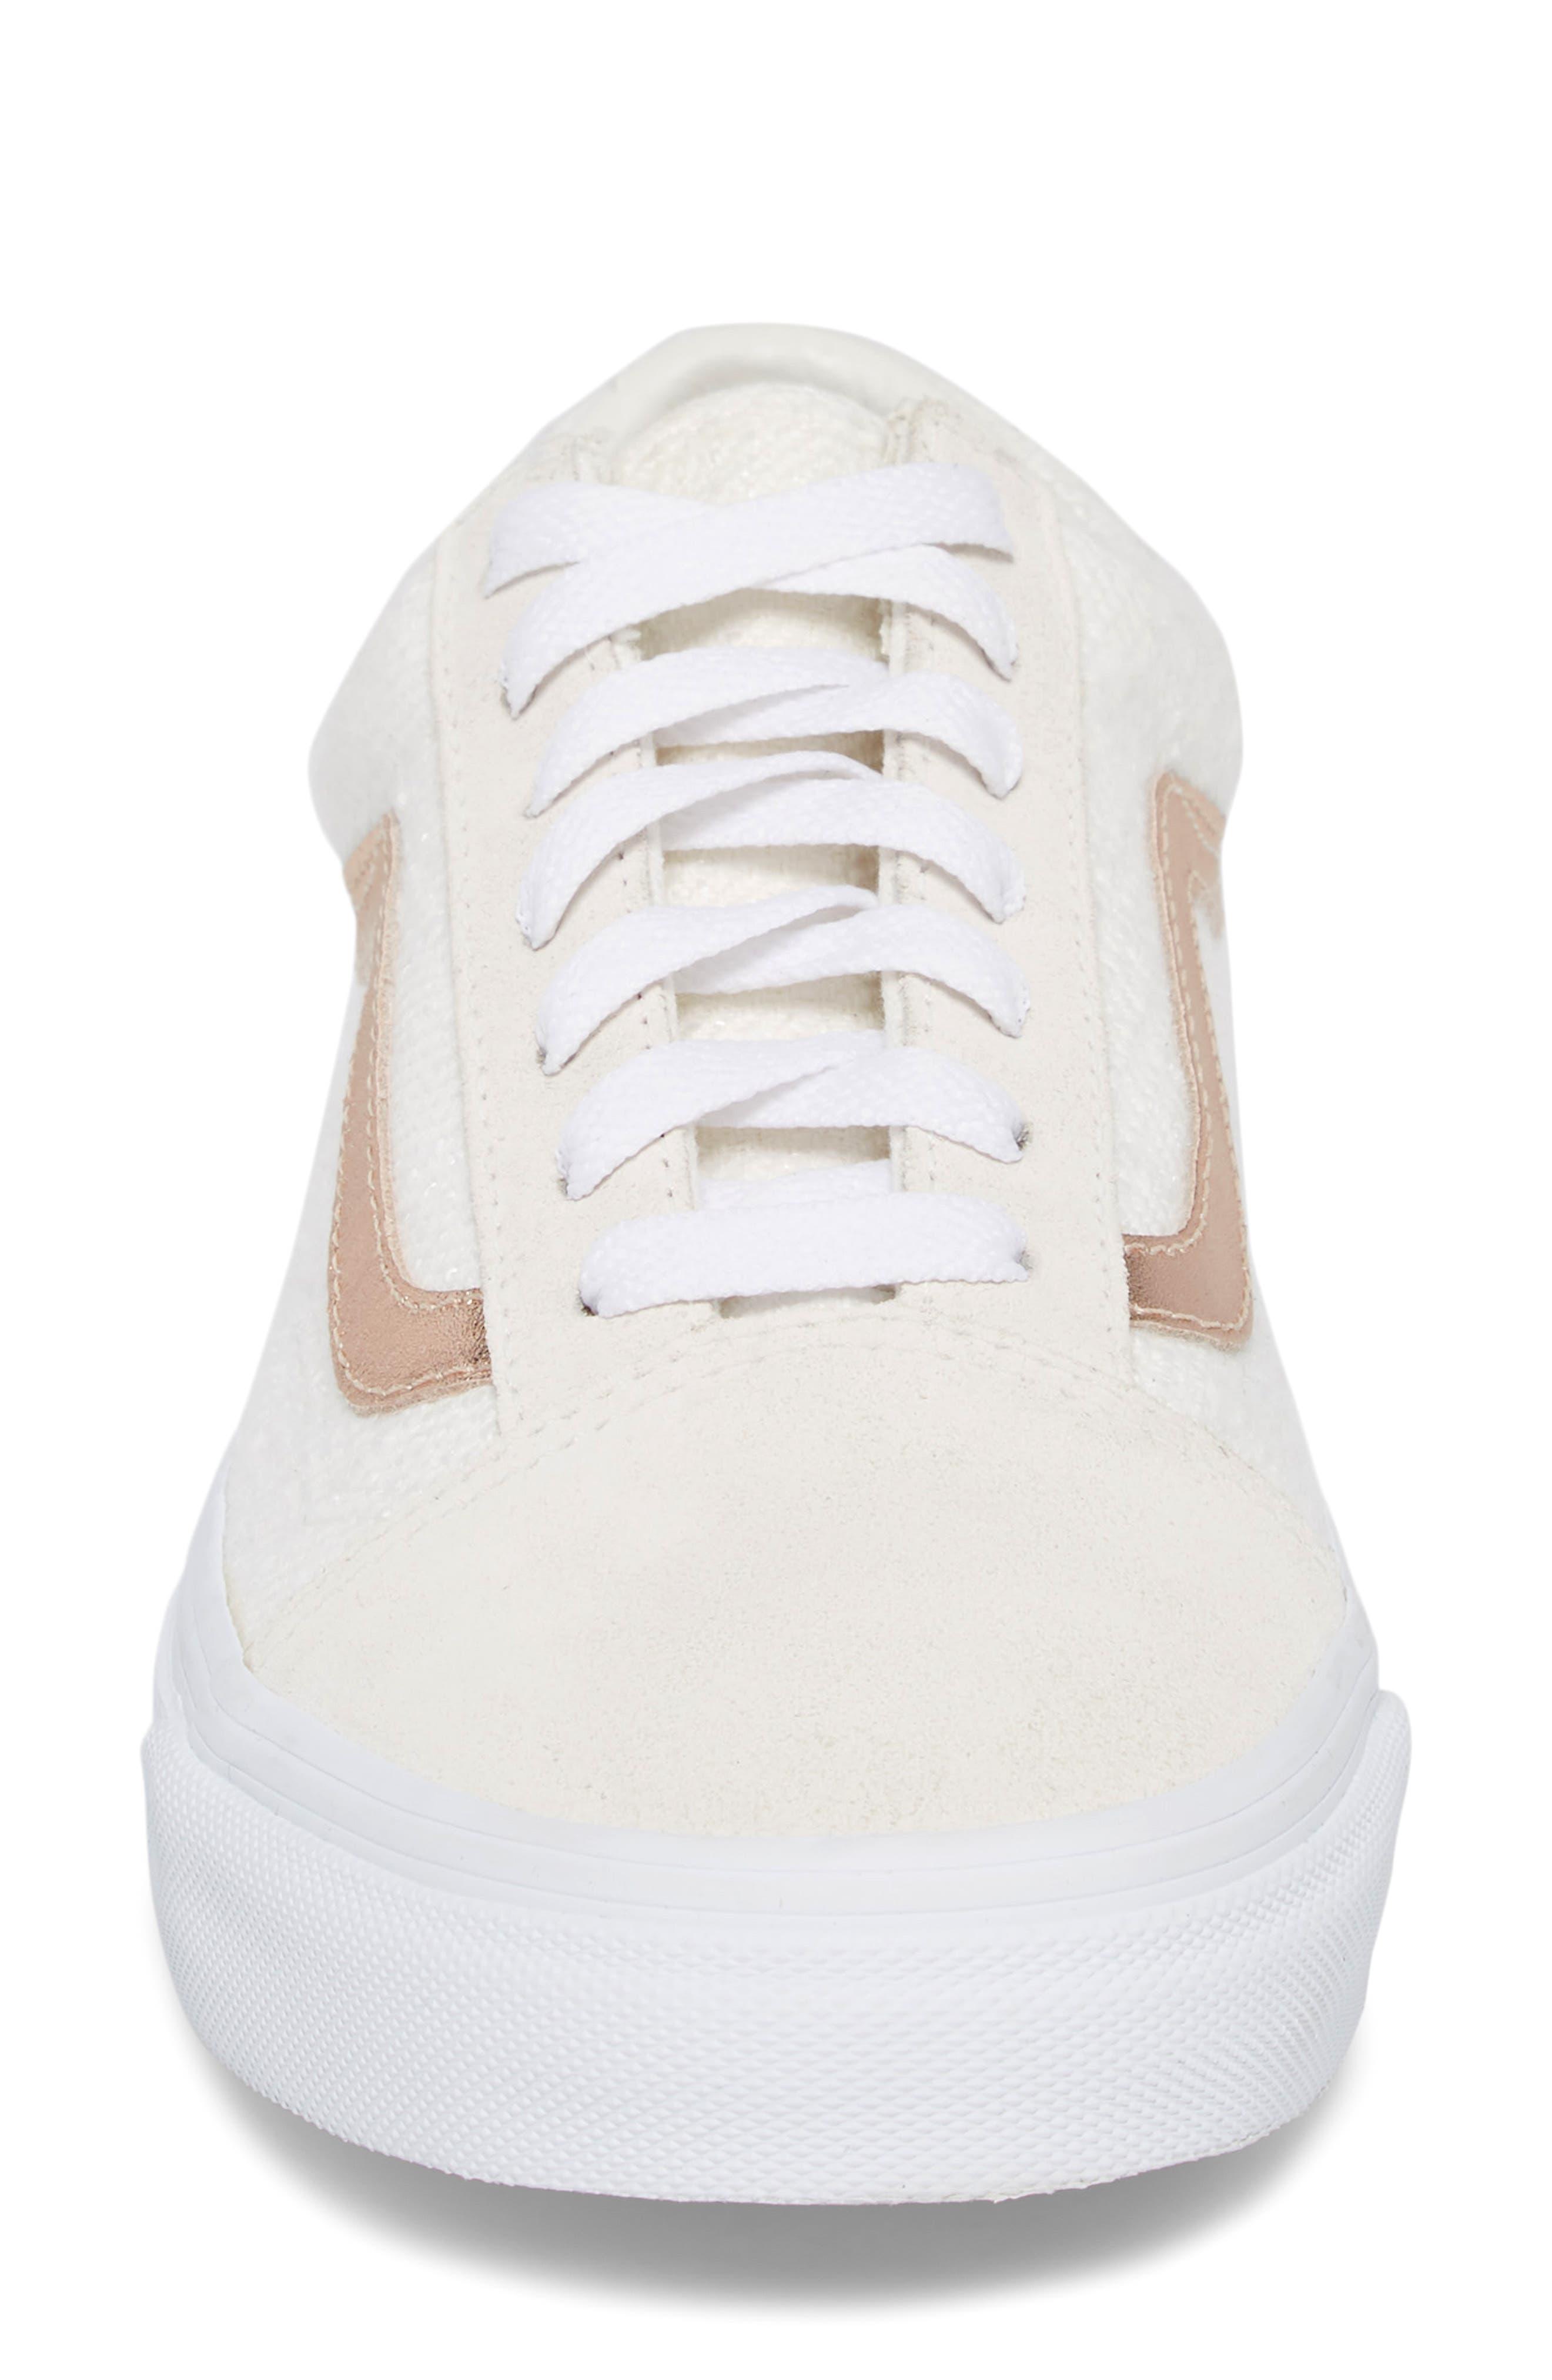 Old Skool Sneaker,                             Alternate thumbnail 6, color,                             Blanc De Blanc/ Rose Gold